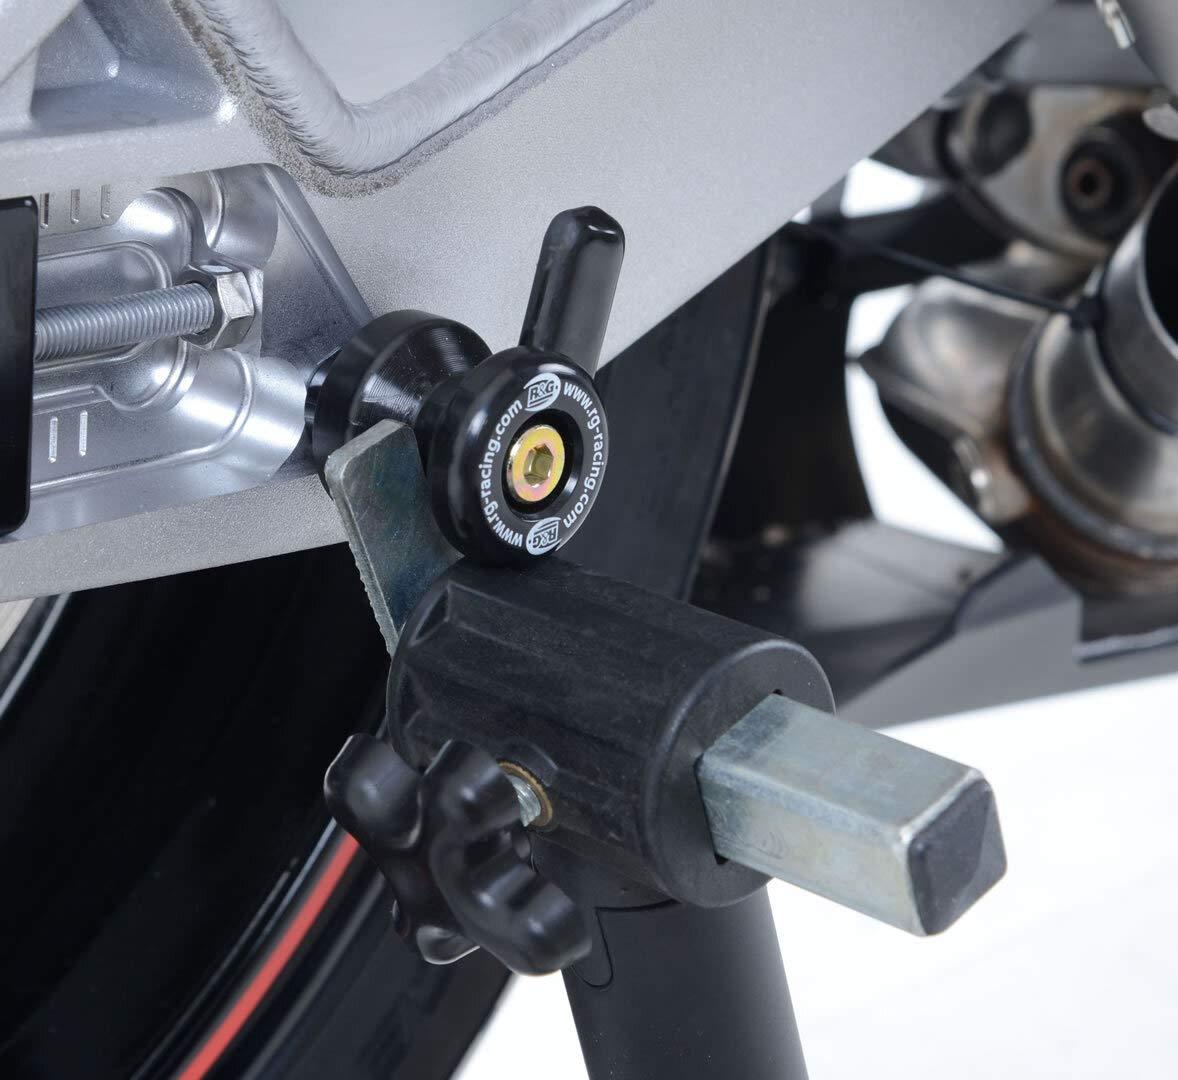 R/&G Racing Products CR0032BK Cotton Reels BMW S1000RR 10-// S1000R 14-// Triumph Street Triple R 13-16 RX 765 RS//R//S 17